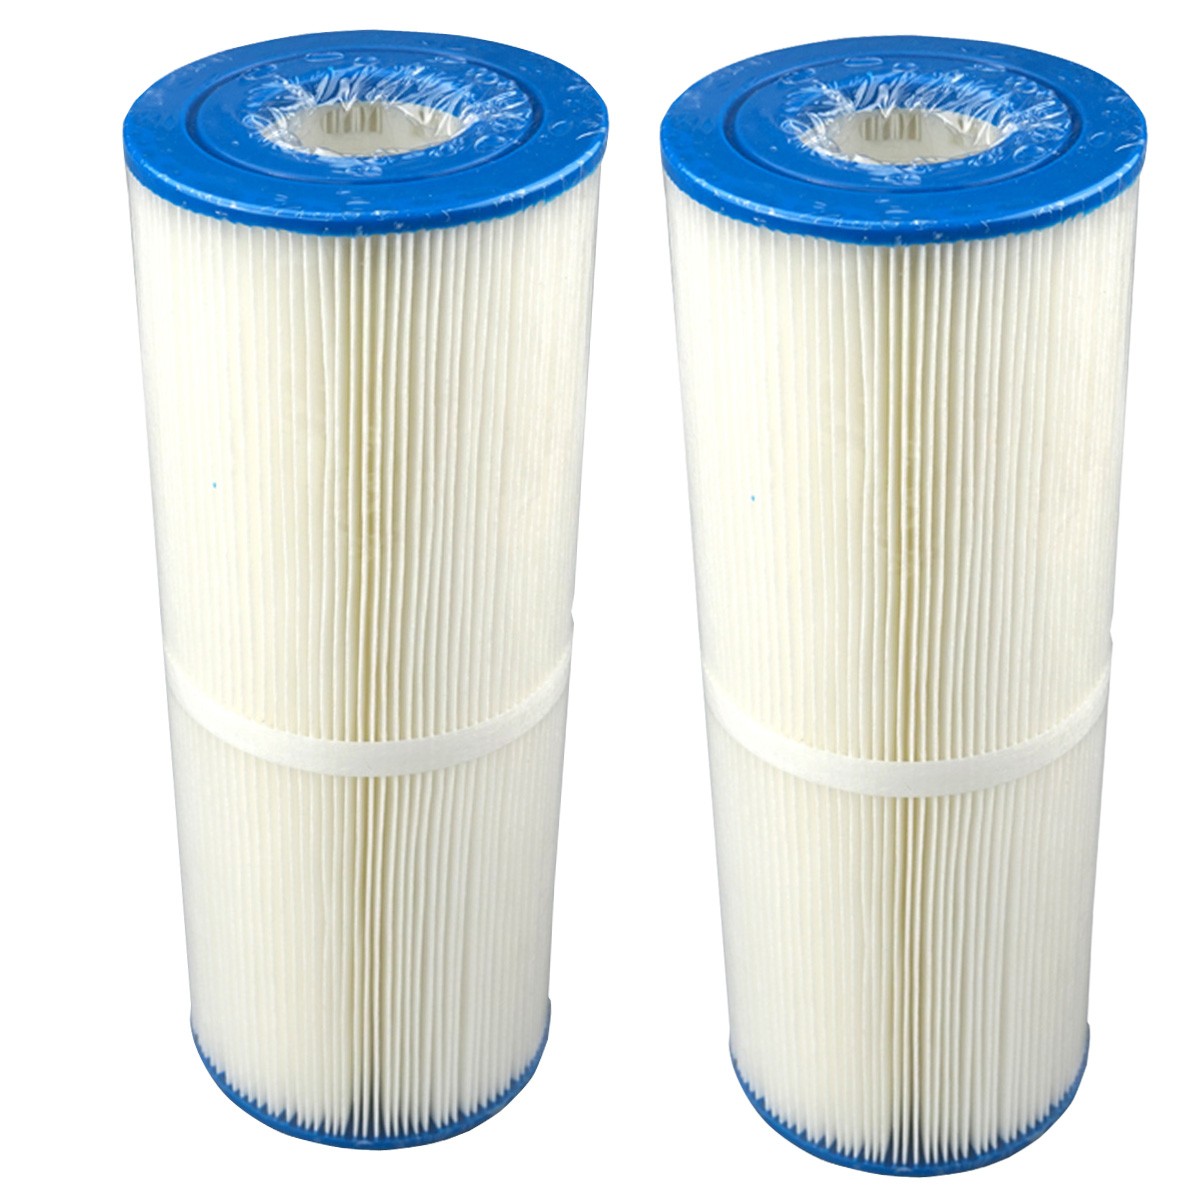 2pcs Whirlpoolfilter Whirlpool Filter PRB25 PRB25 IN FC 2375 C 4326 SC704 42513